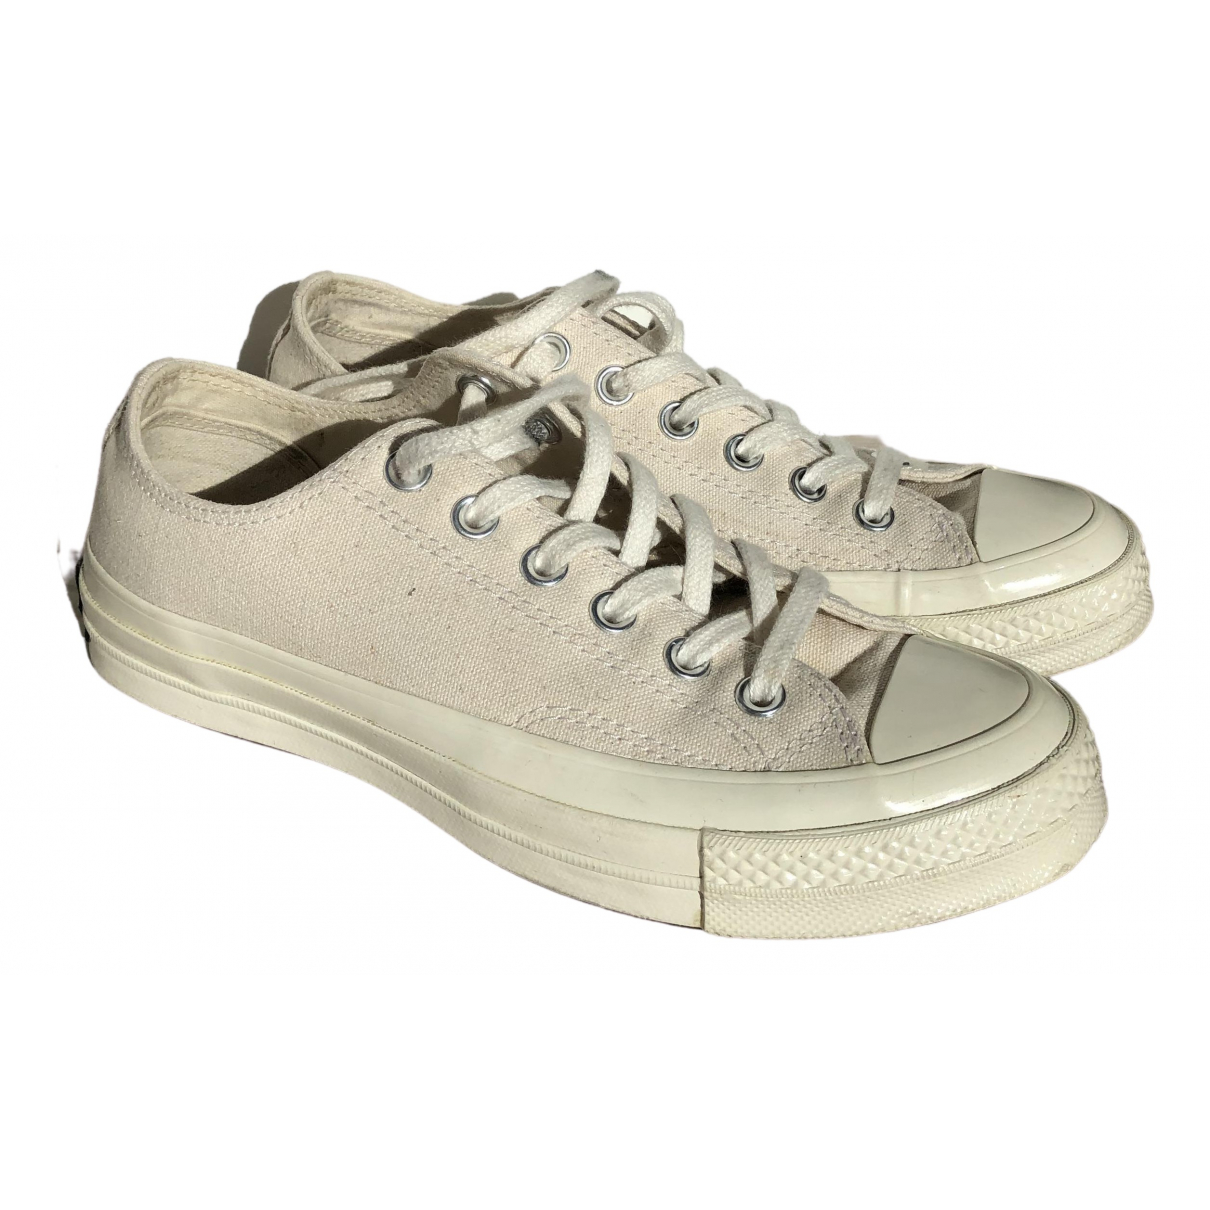 Converse \N Beige Cloth Trainers for Women 37.5 EU